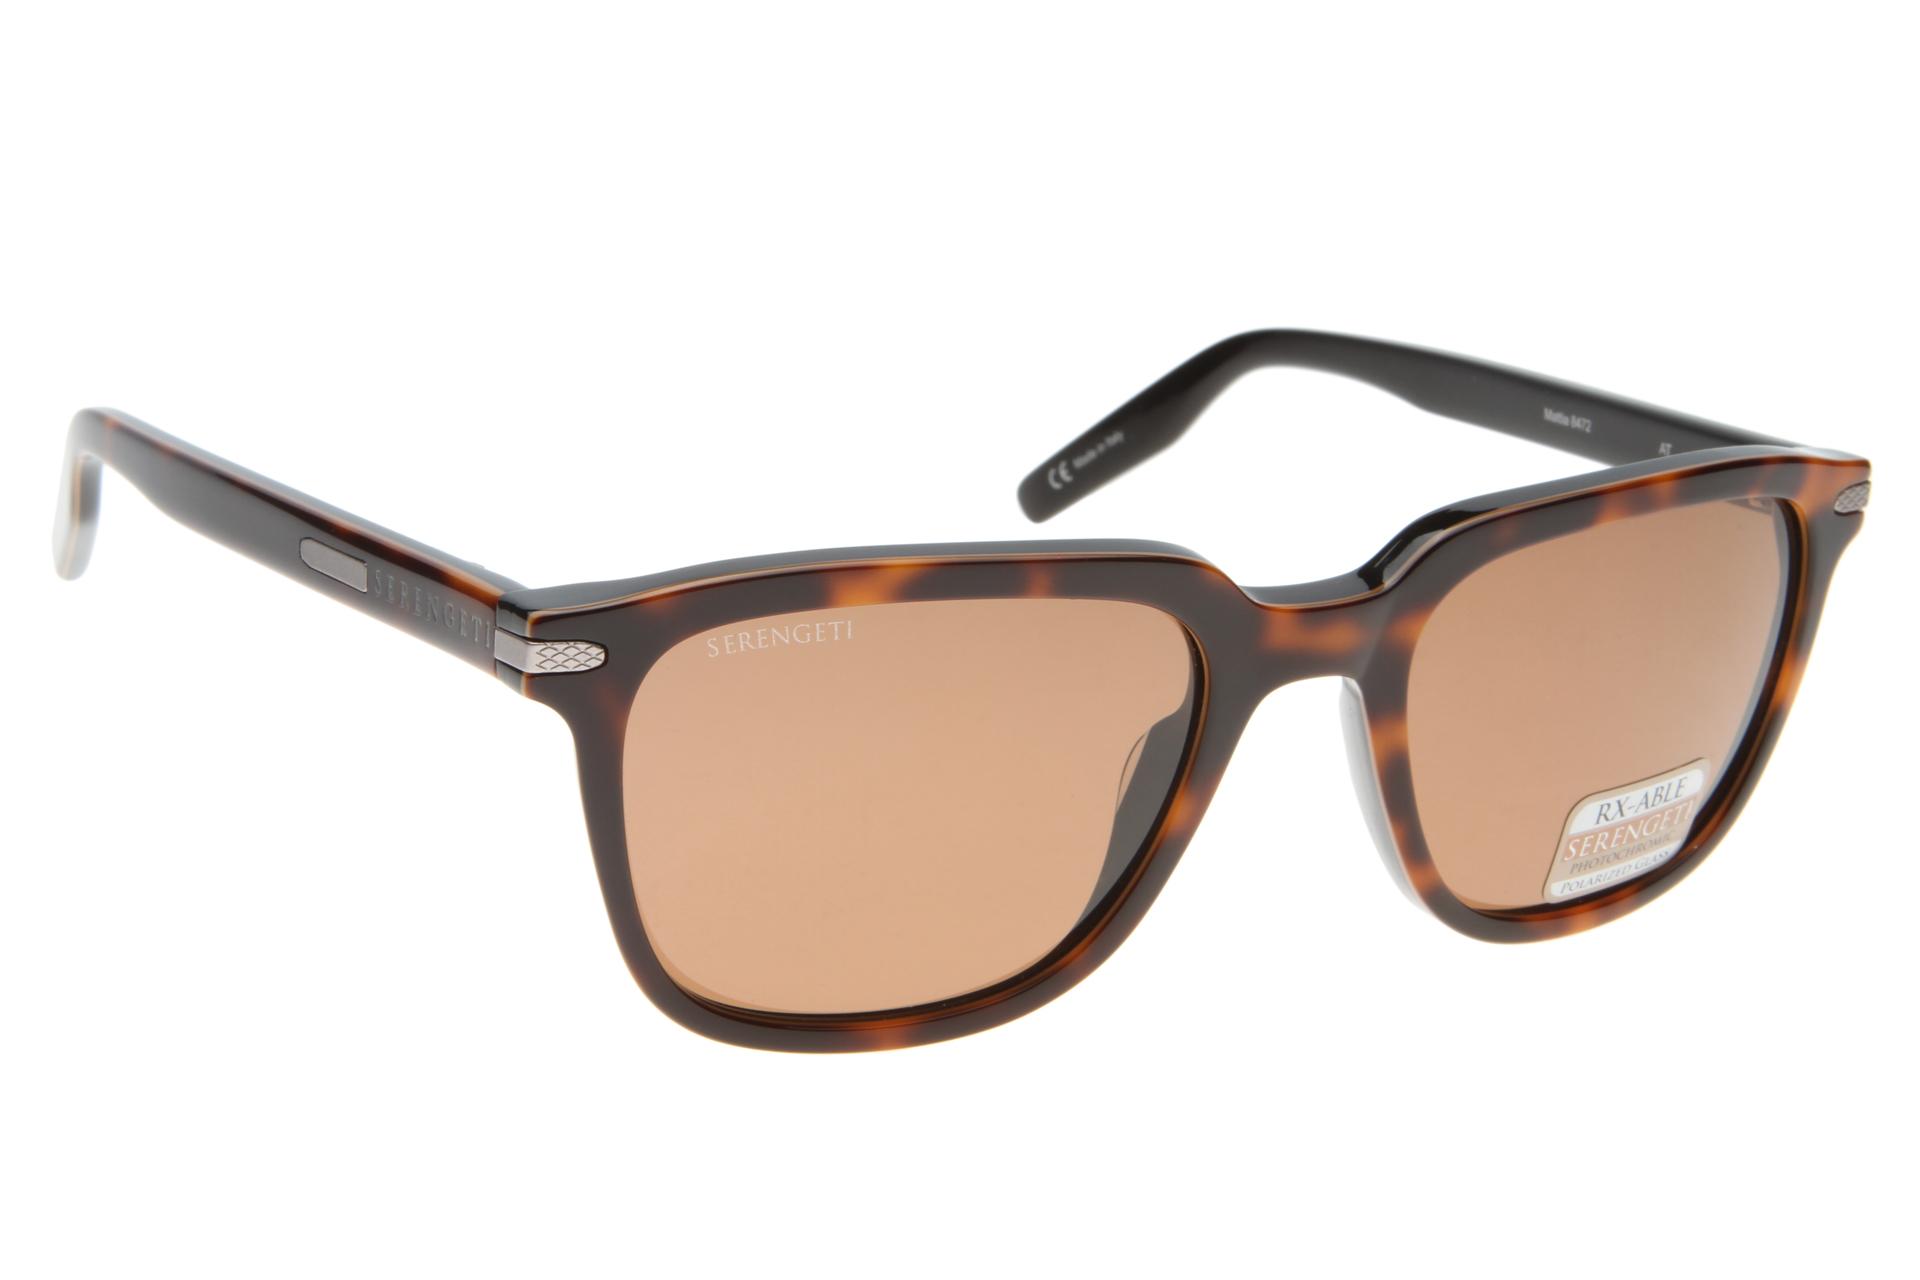 d47c0d6d7c2eab Serengeti Mattia 8472 (Shiny Dark Tortoise Black) Gepolarise zonnebril